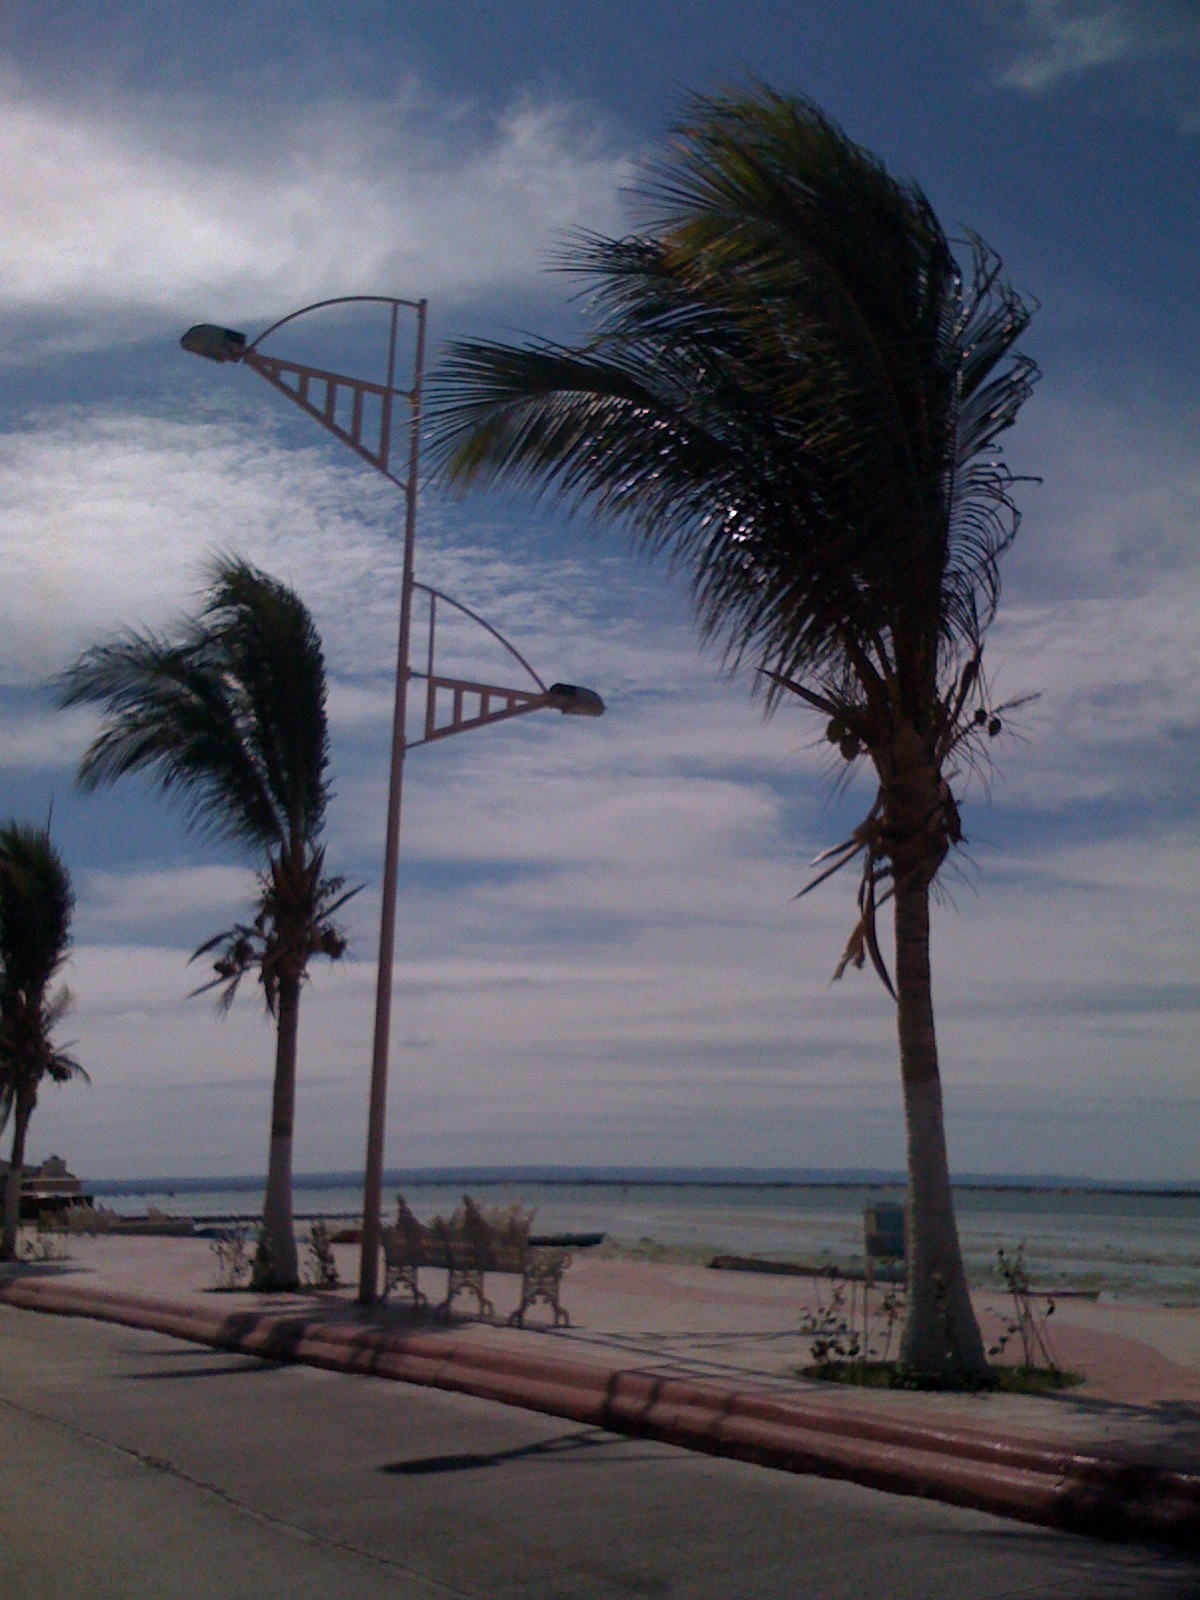 Extreme Sports in Puerto Vallarta